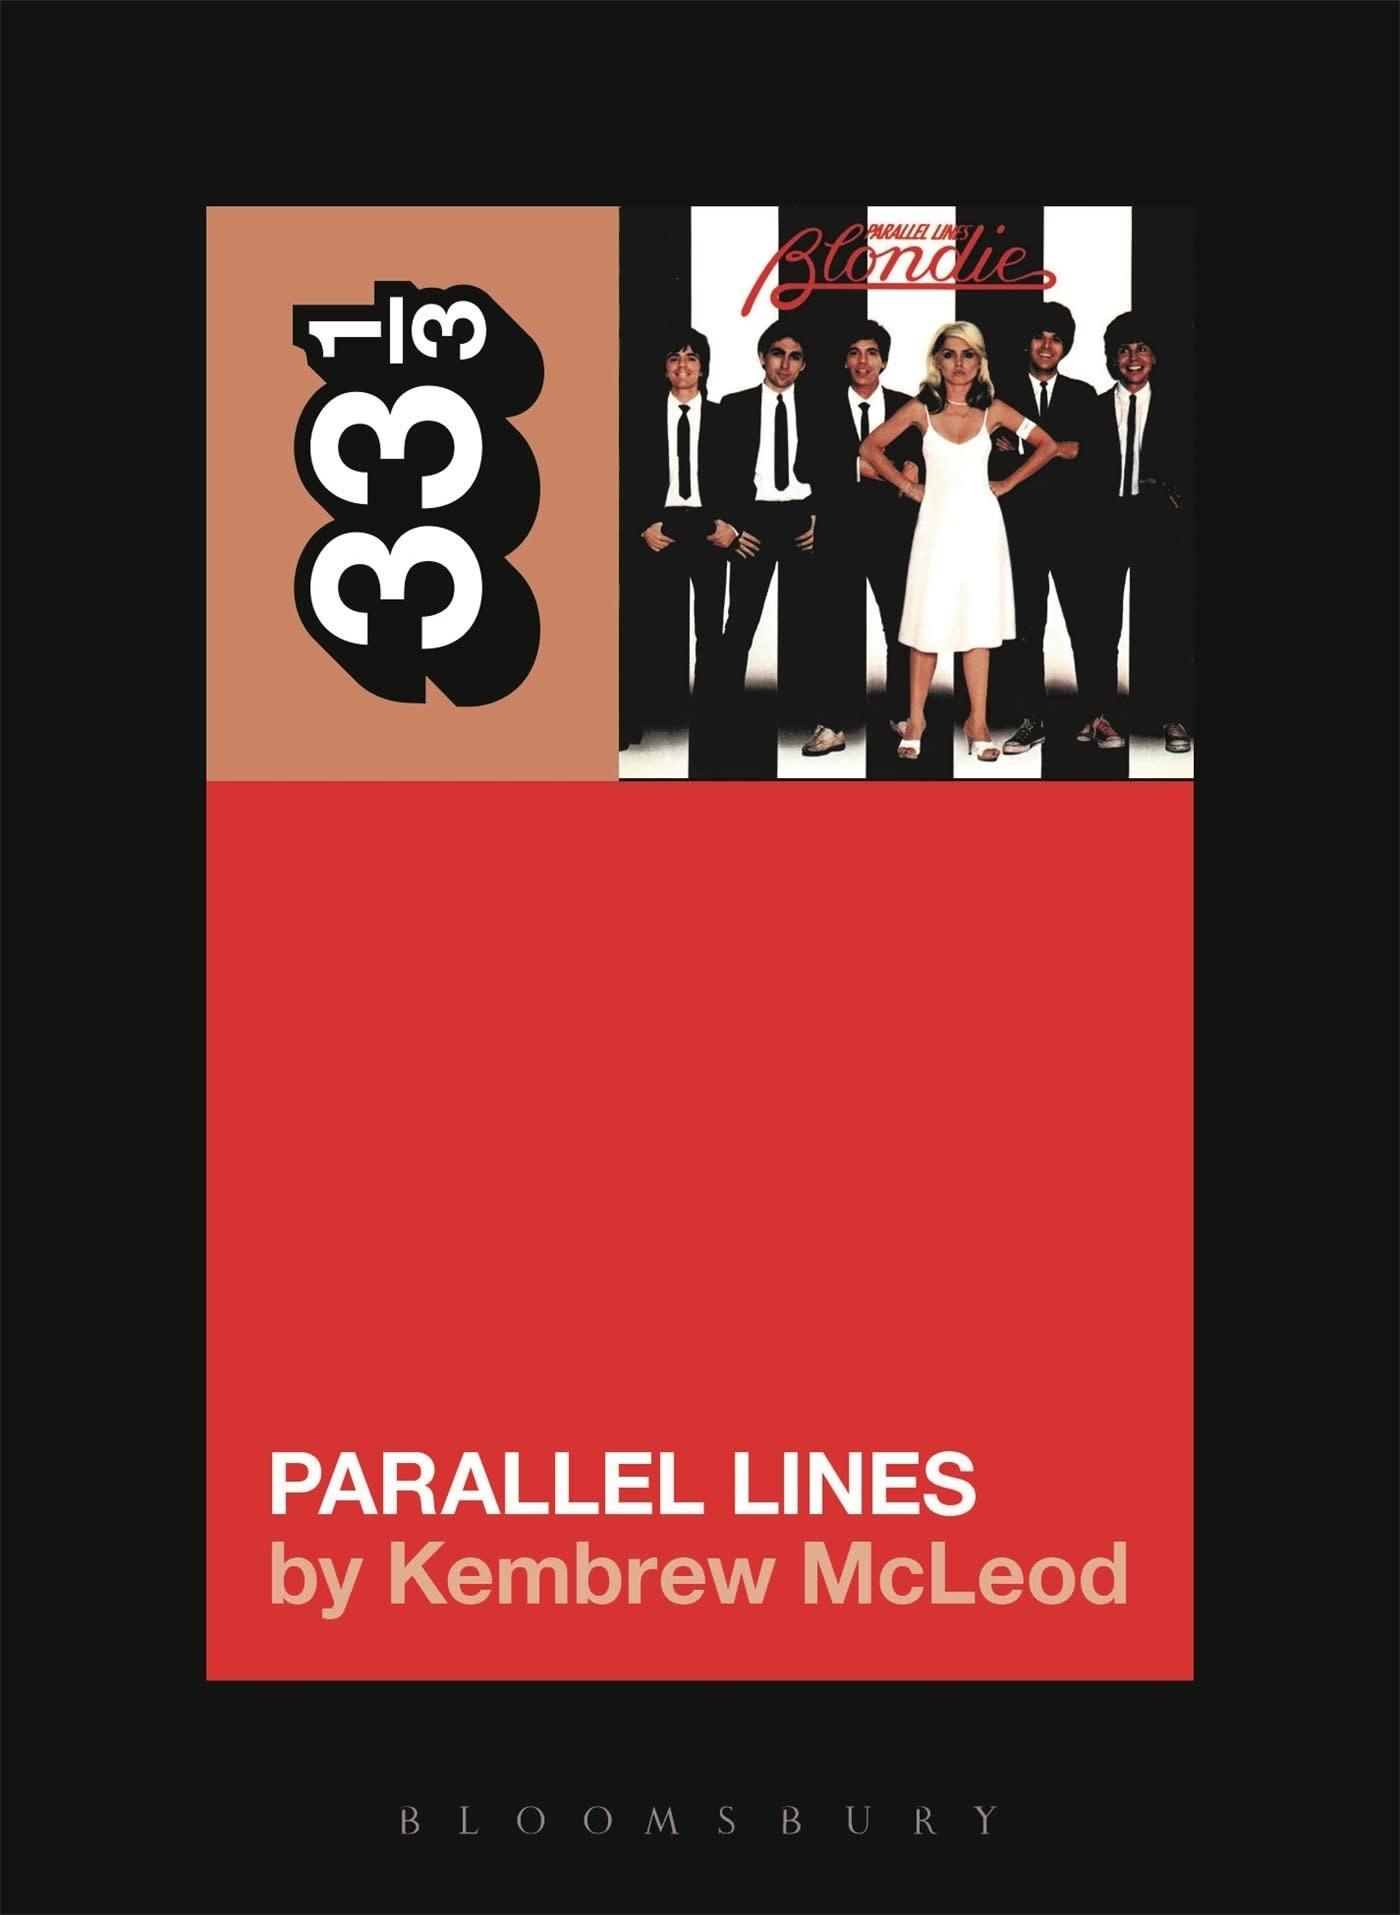 33 1/3 Series 33 1/3 - #111 - Blondie's Parallel Lines - Kembrew McLeod